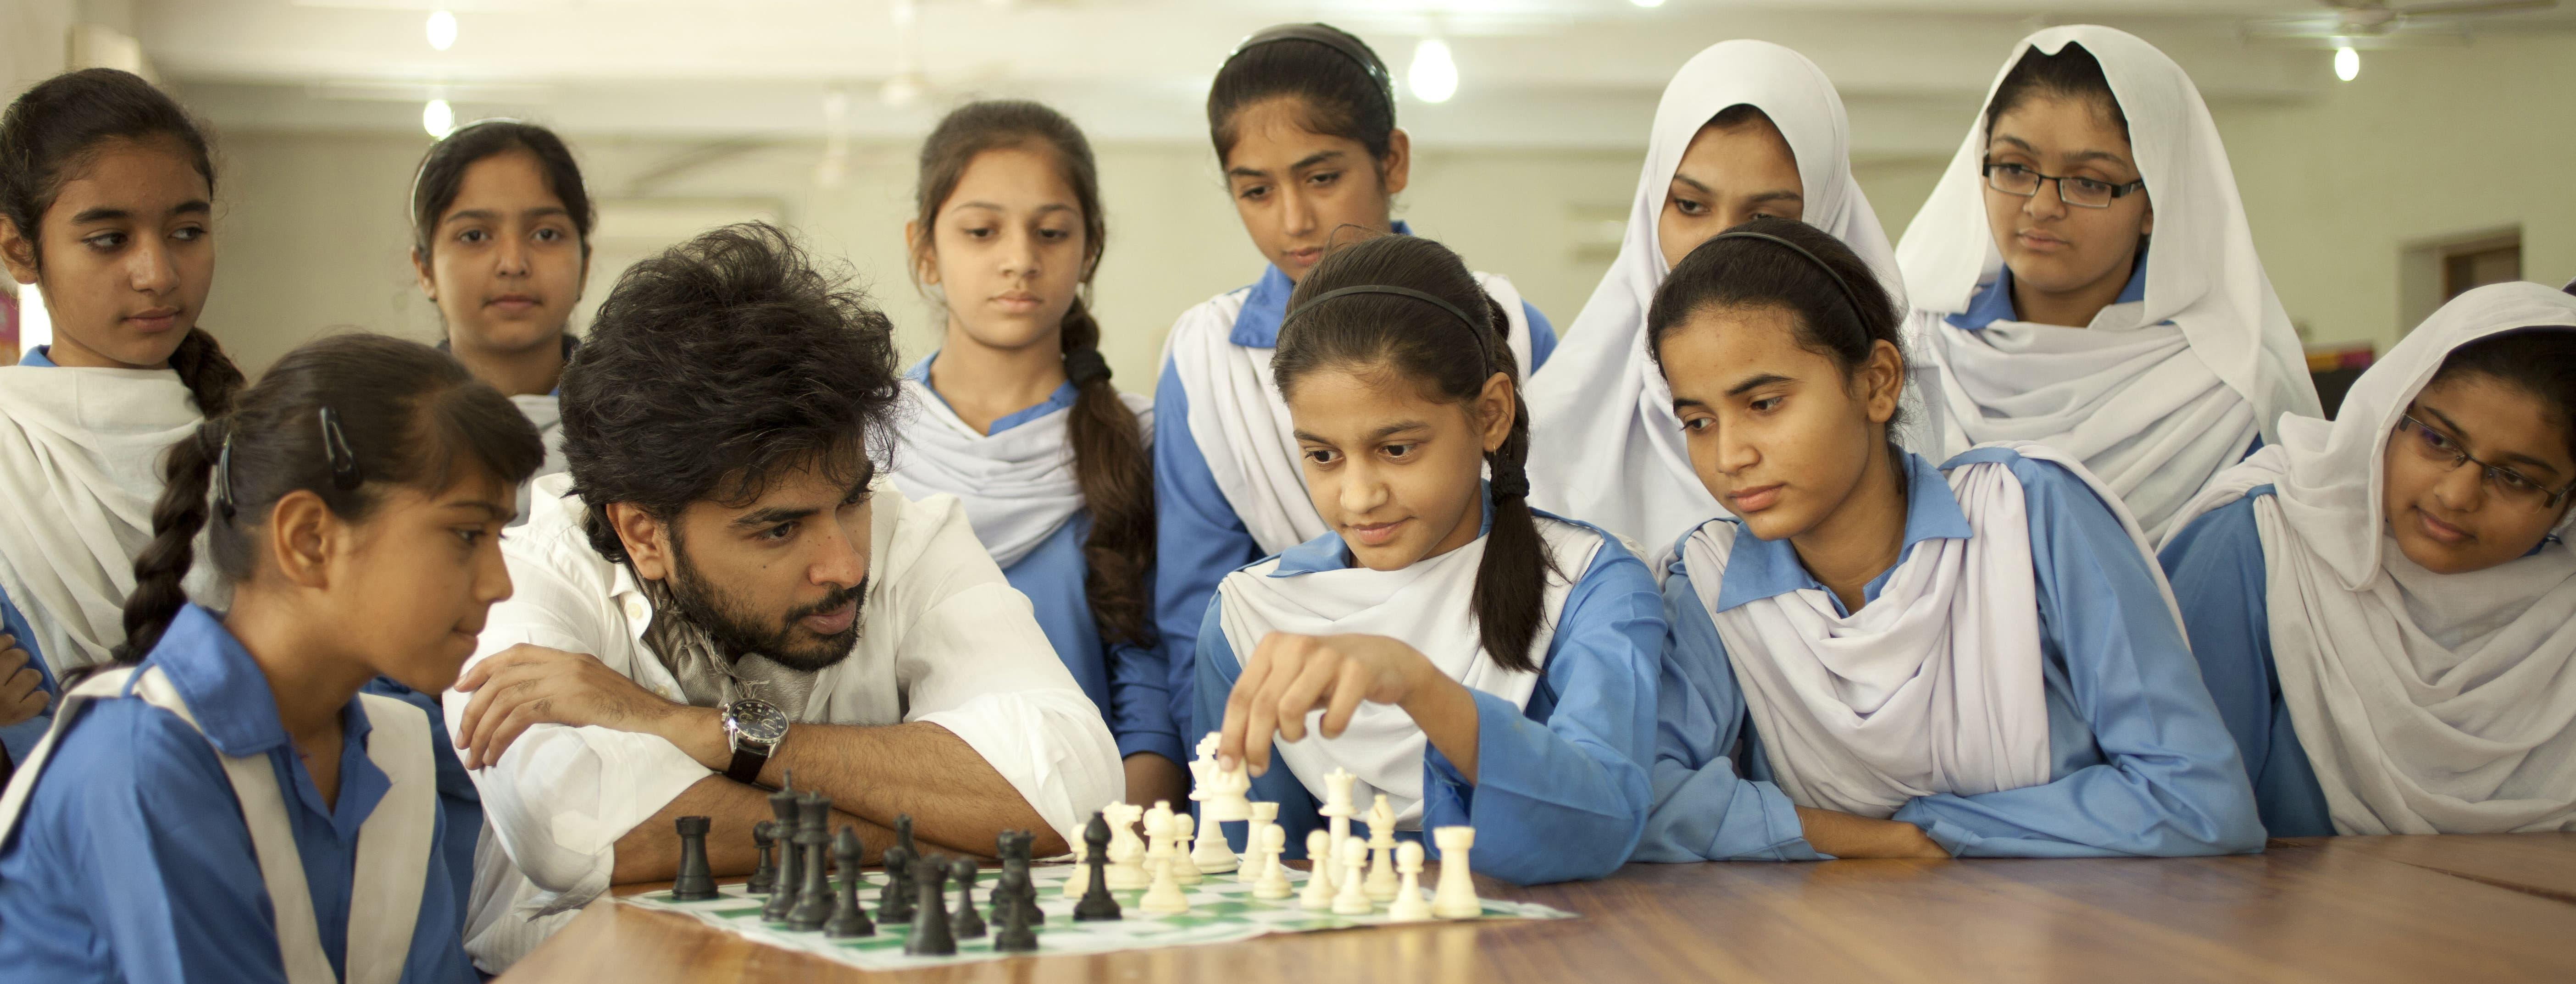 Our children deserve more': Shehzad Roy recalls struggles